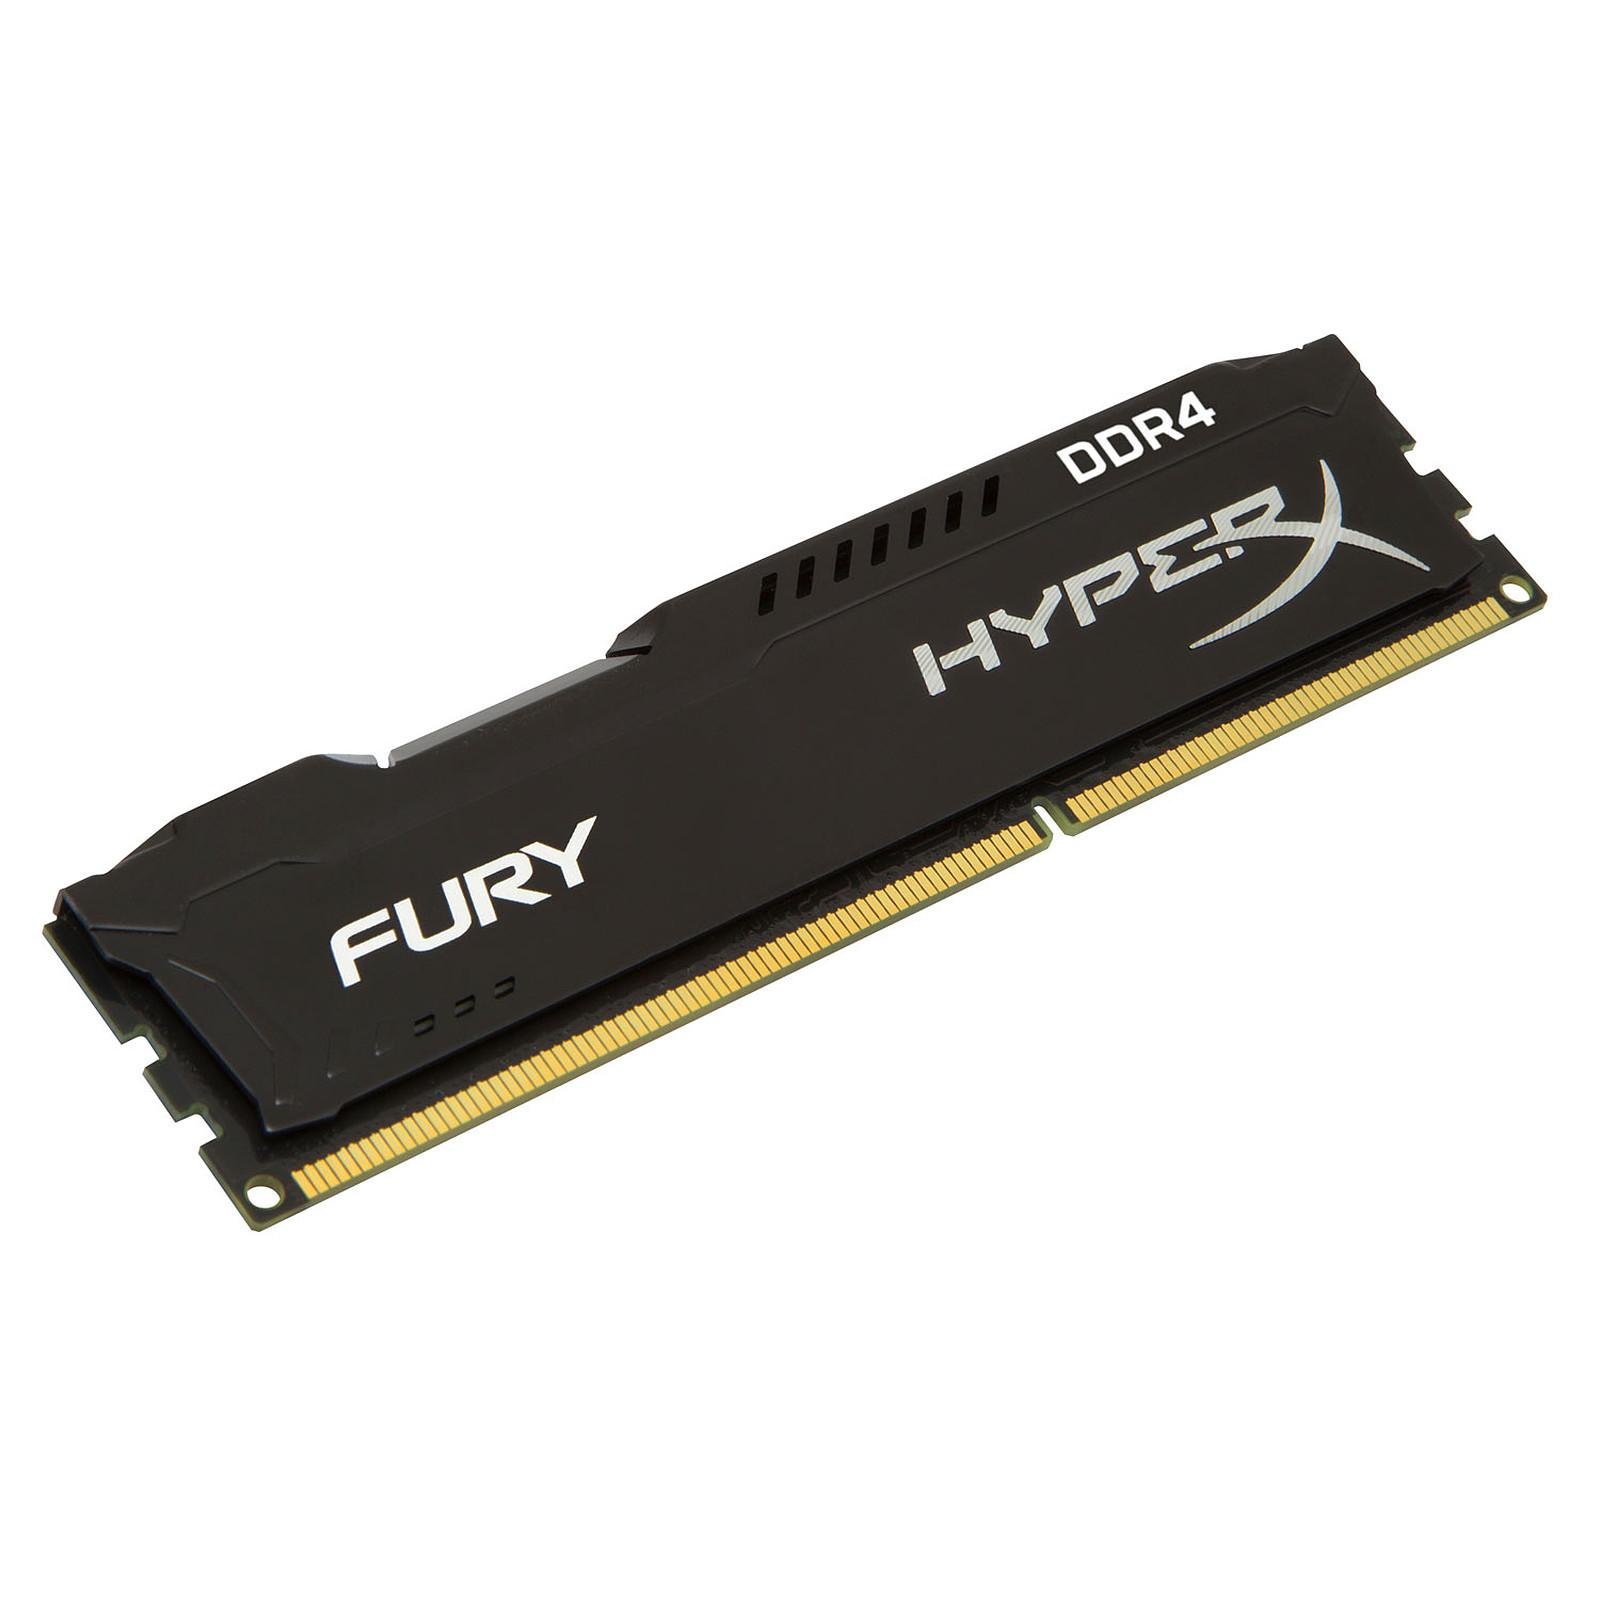 HyperX Fury Noir 8 Go DDR4 2666 MHz CL16